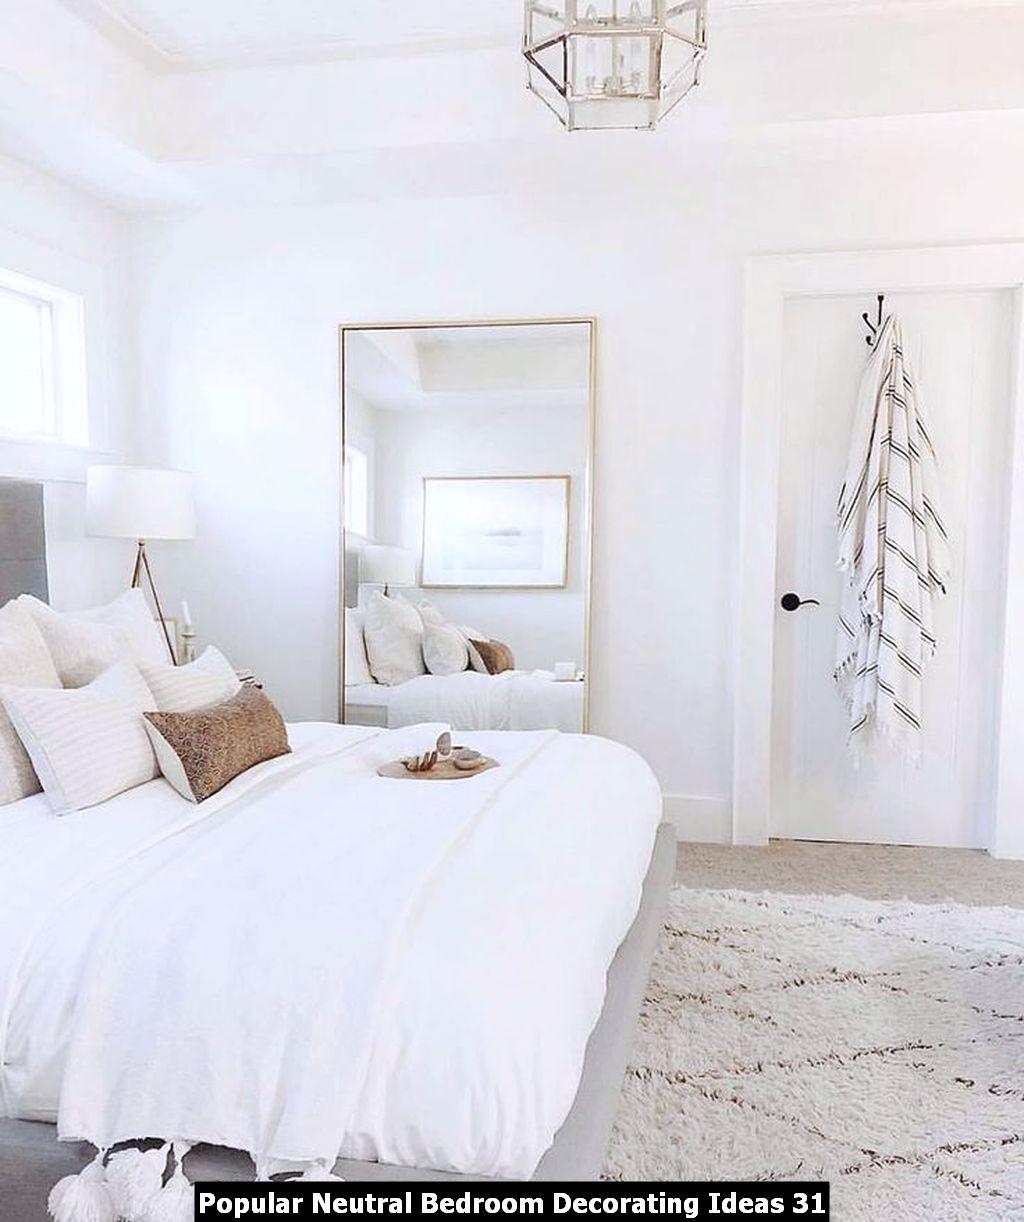 Popular Neutral Bedroom Decorating Ideas 31